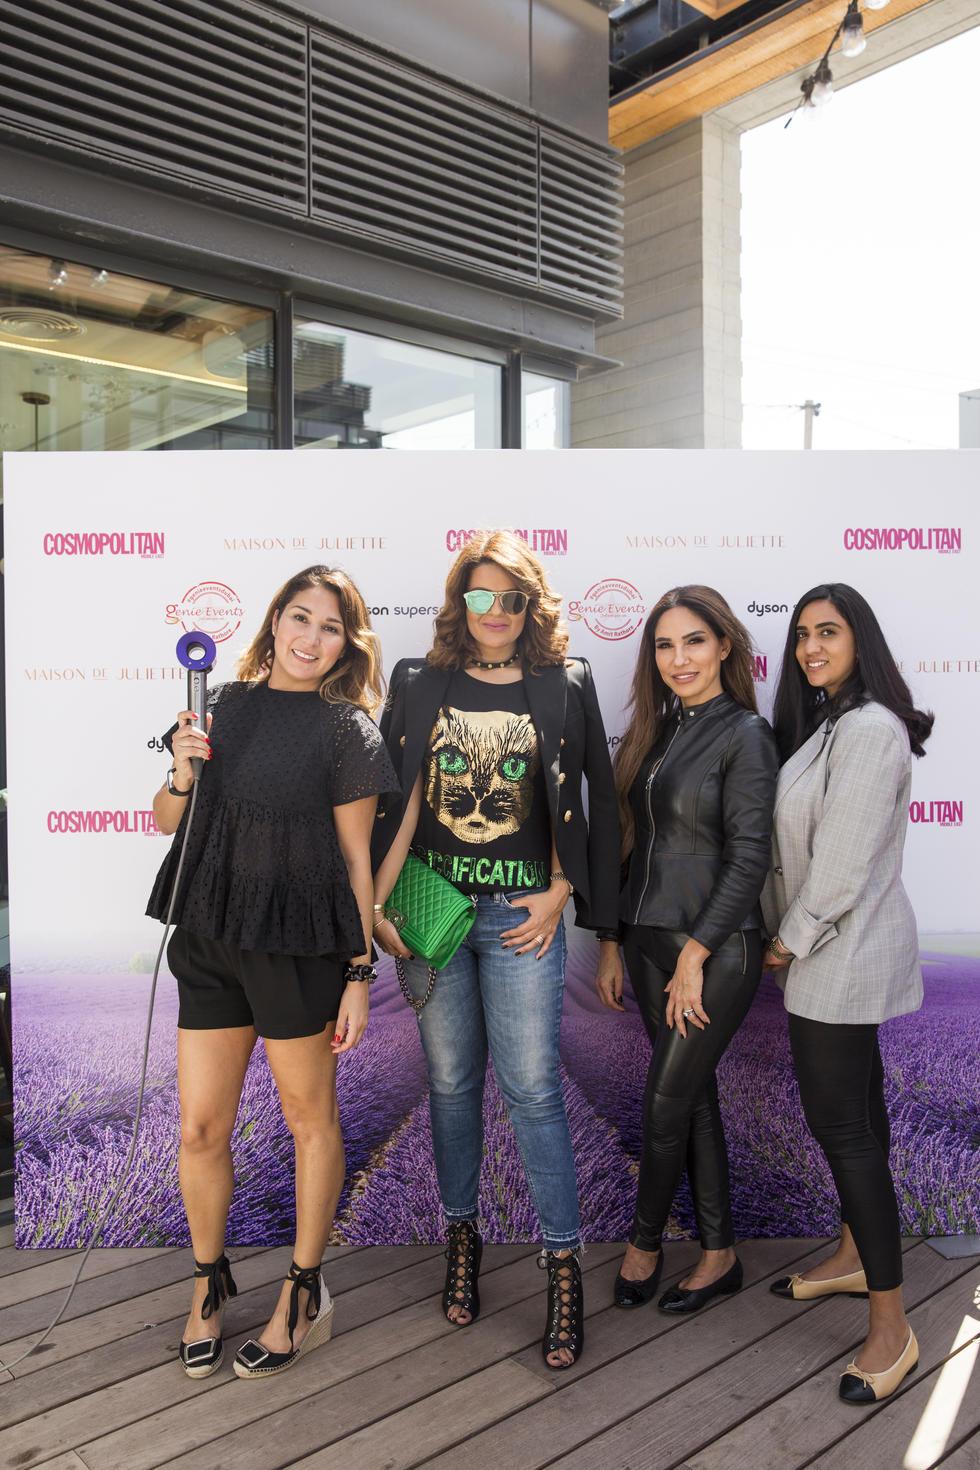 Joelle Barakat, Sara Abdallah, Samar Bawab and Heba Atallah